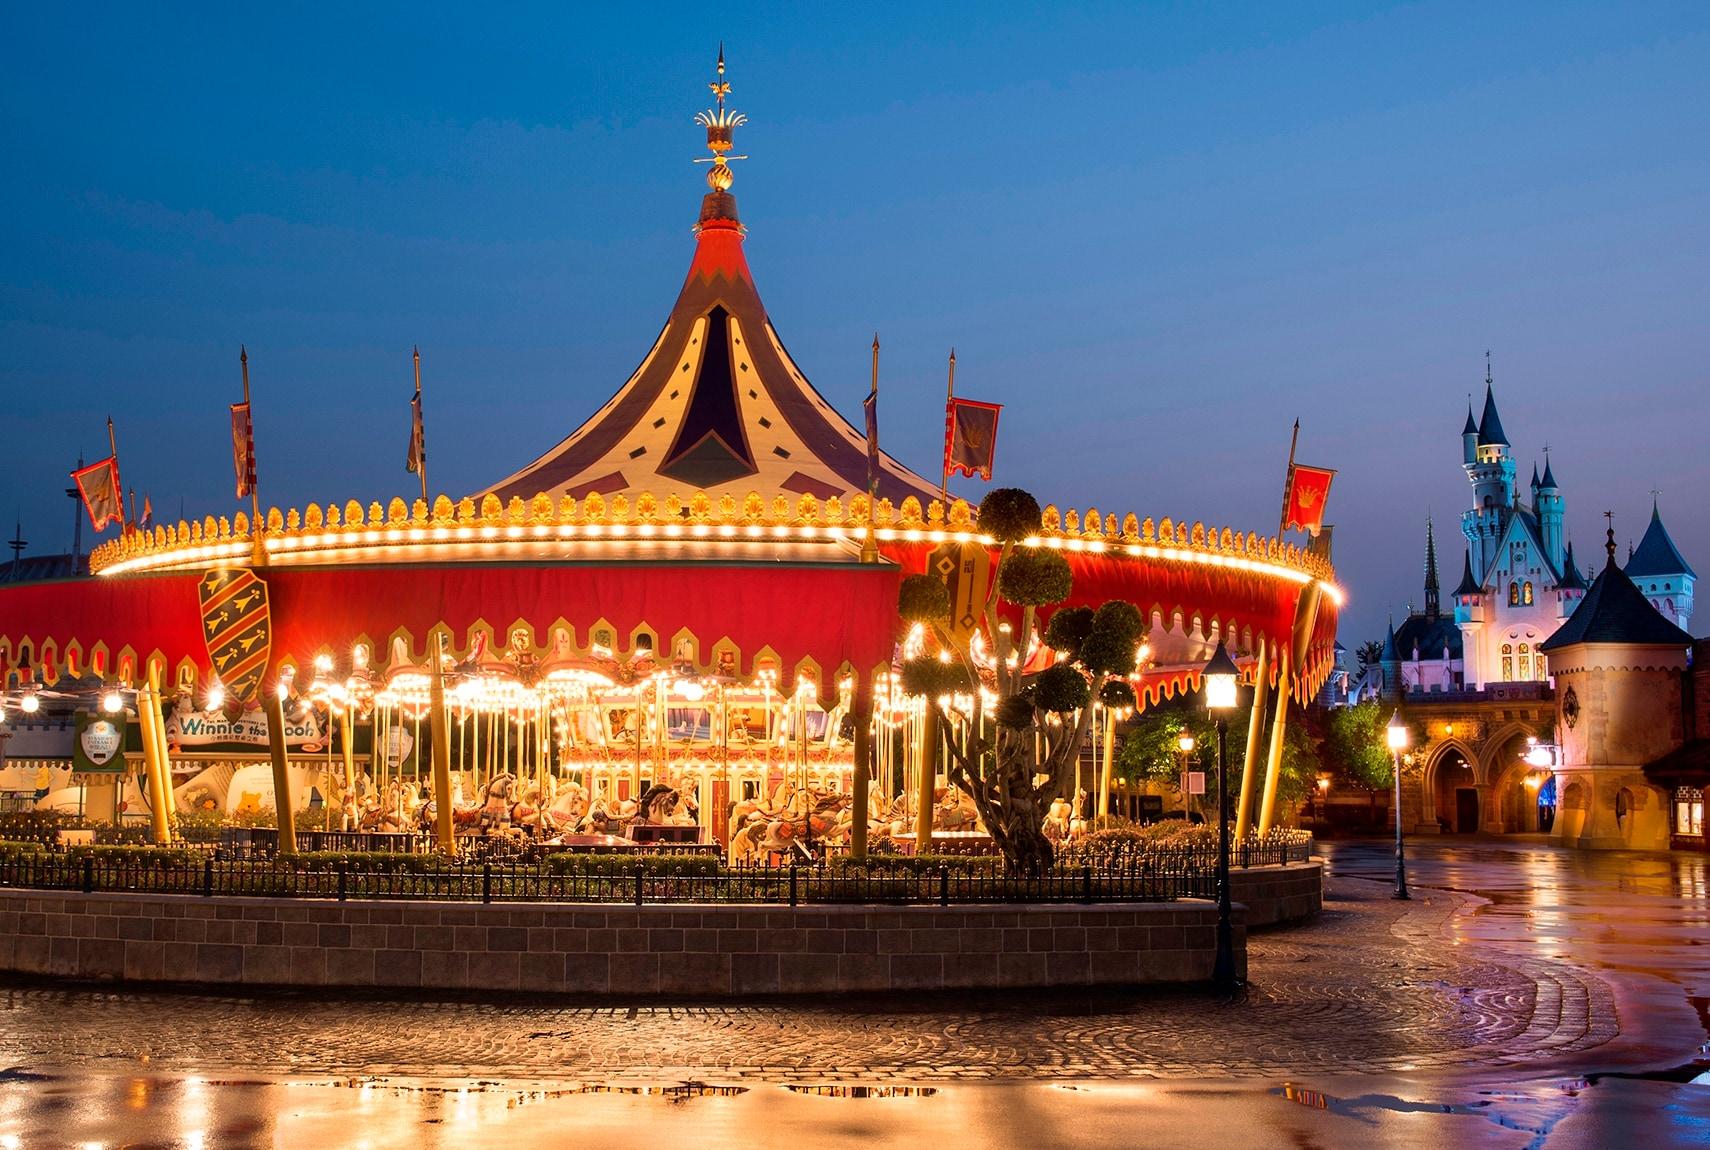 Disneyland Tour Video